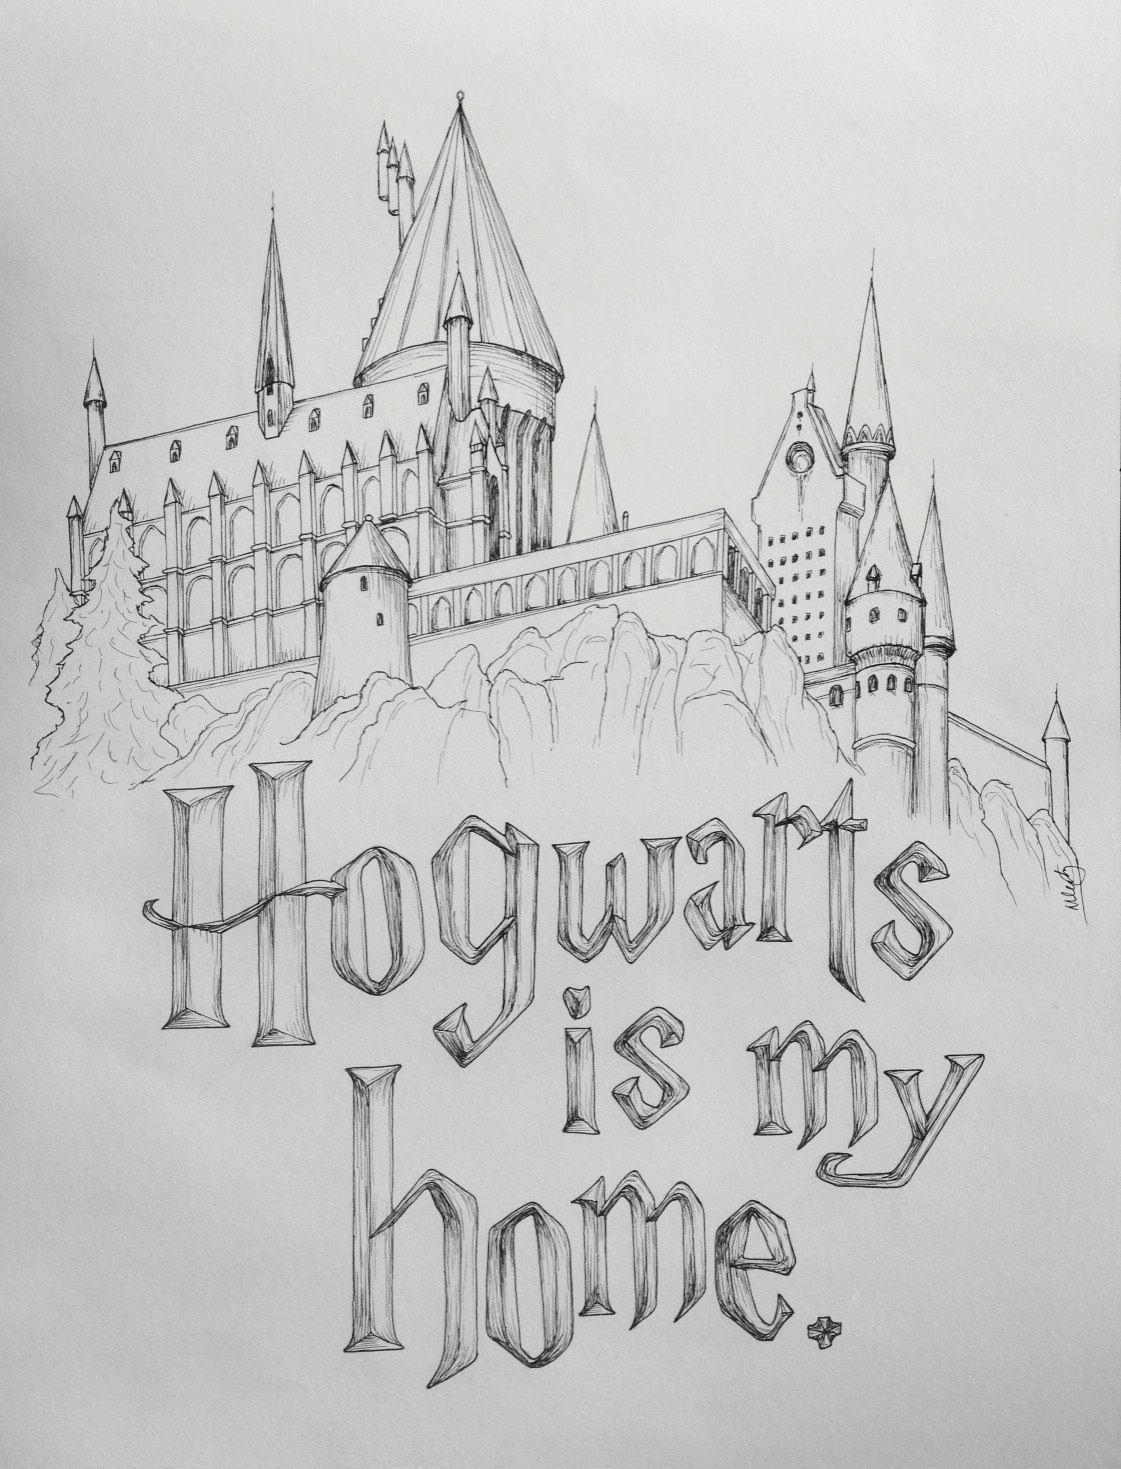 Harry potter rocks my world hogwarts is my home hogwarts castle art print on etsy